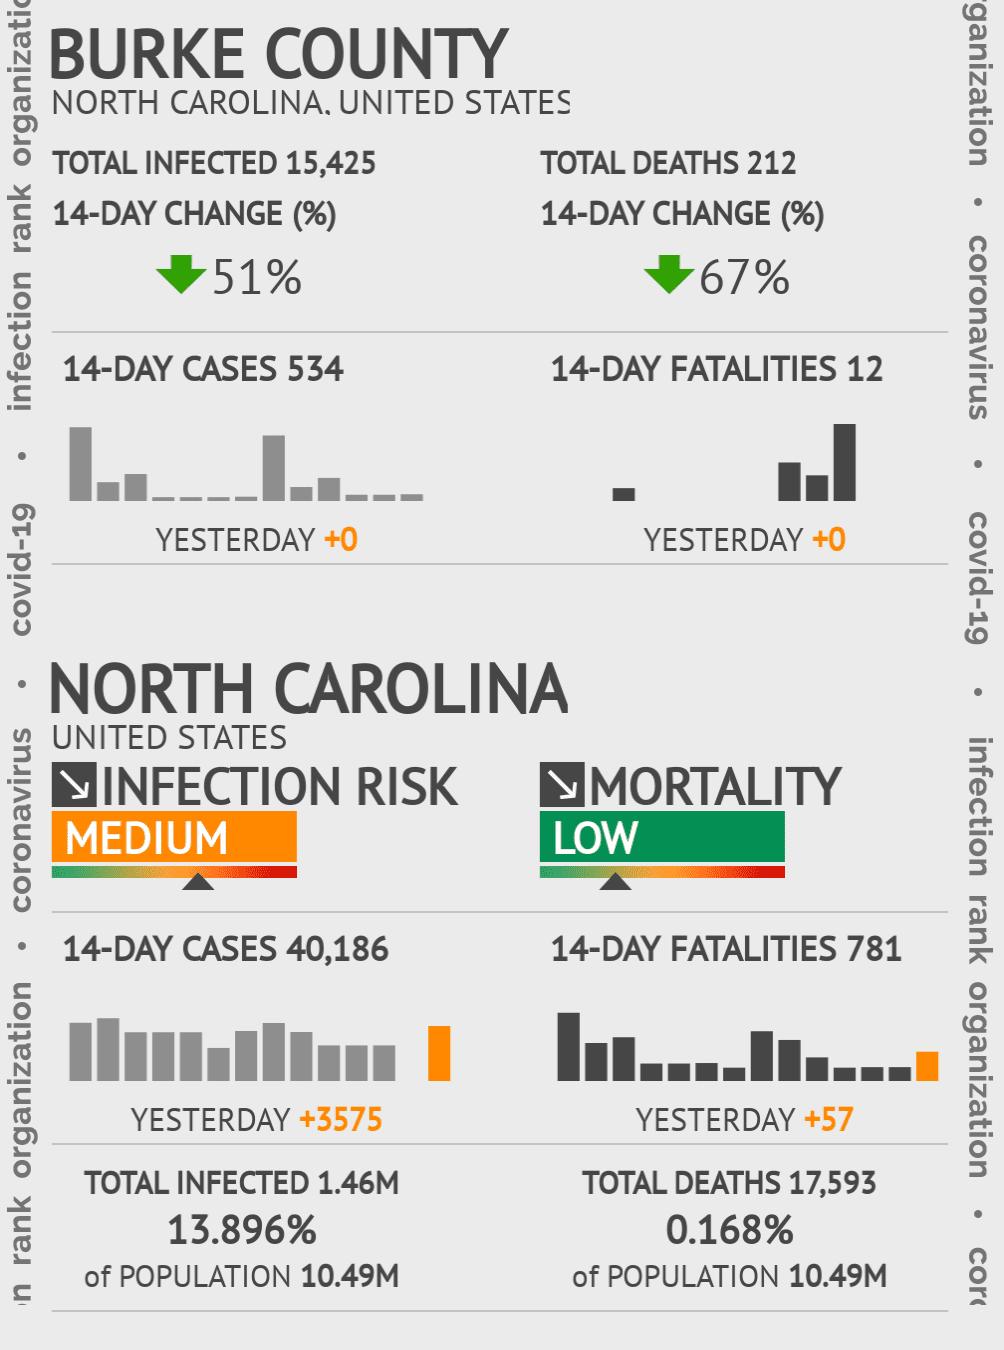 Burke County Coronavirus Covid-19 Risk of Infection on November 28, 2020